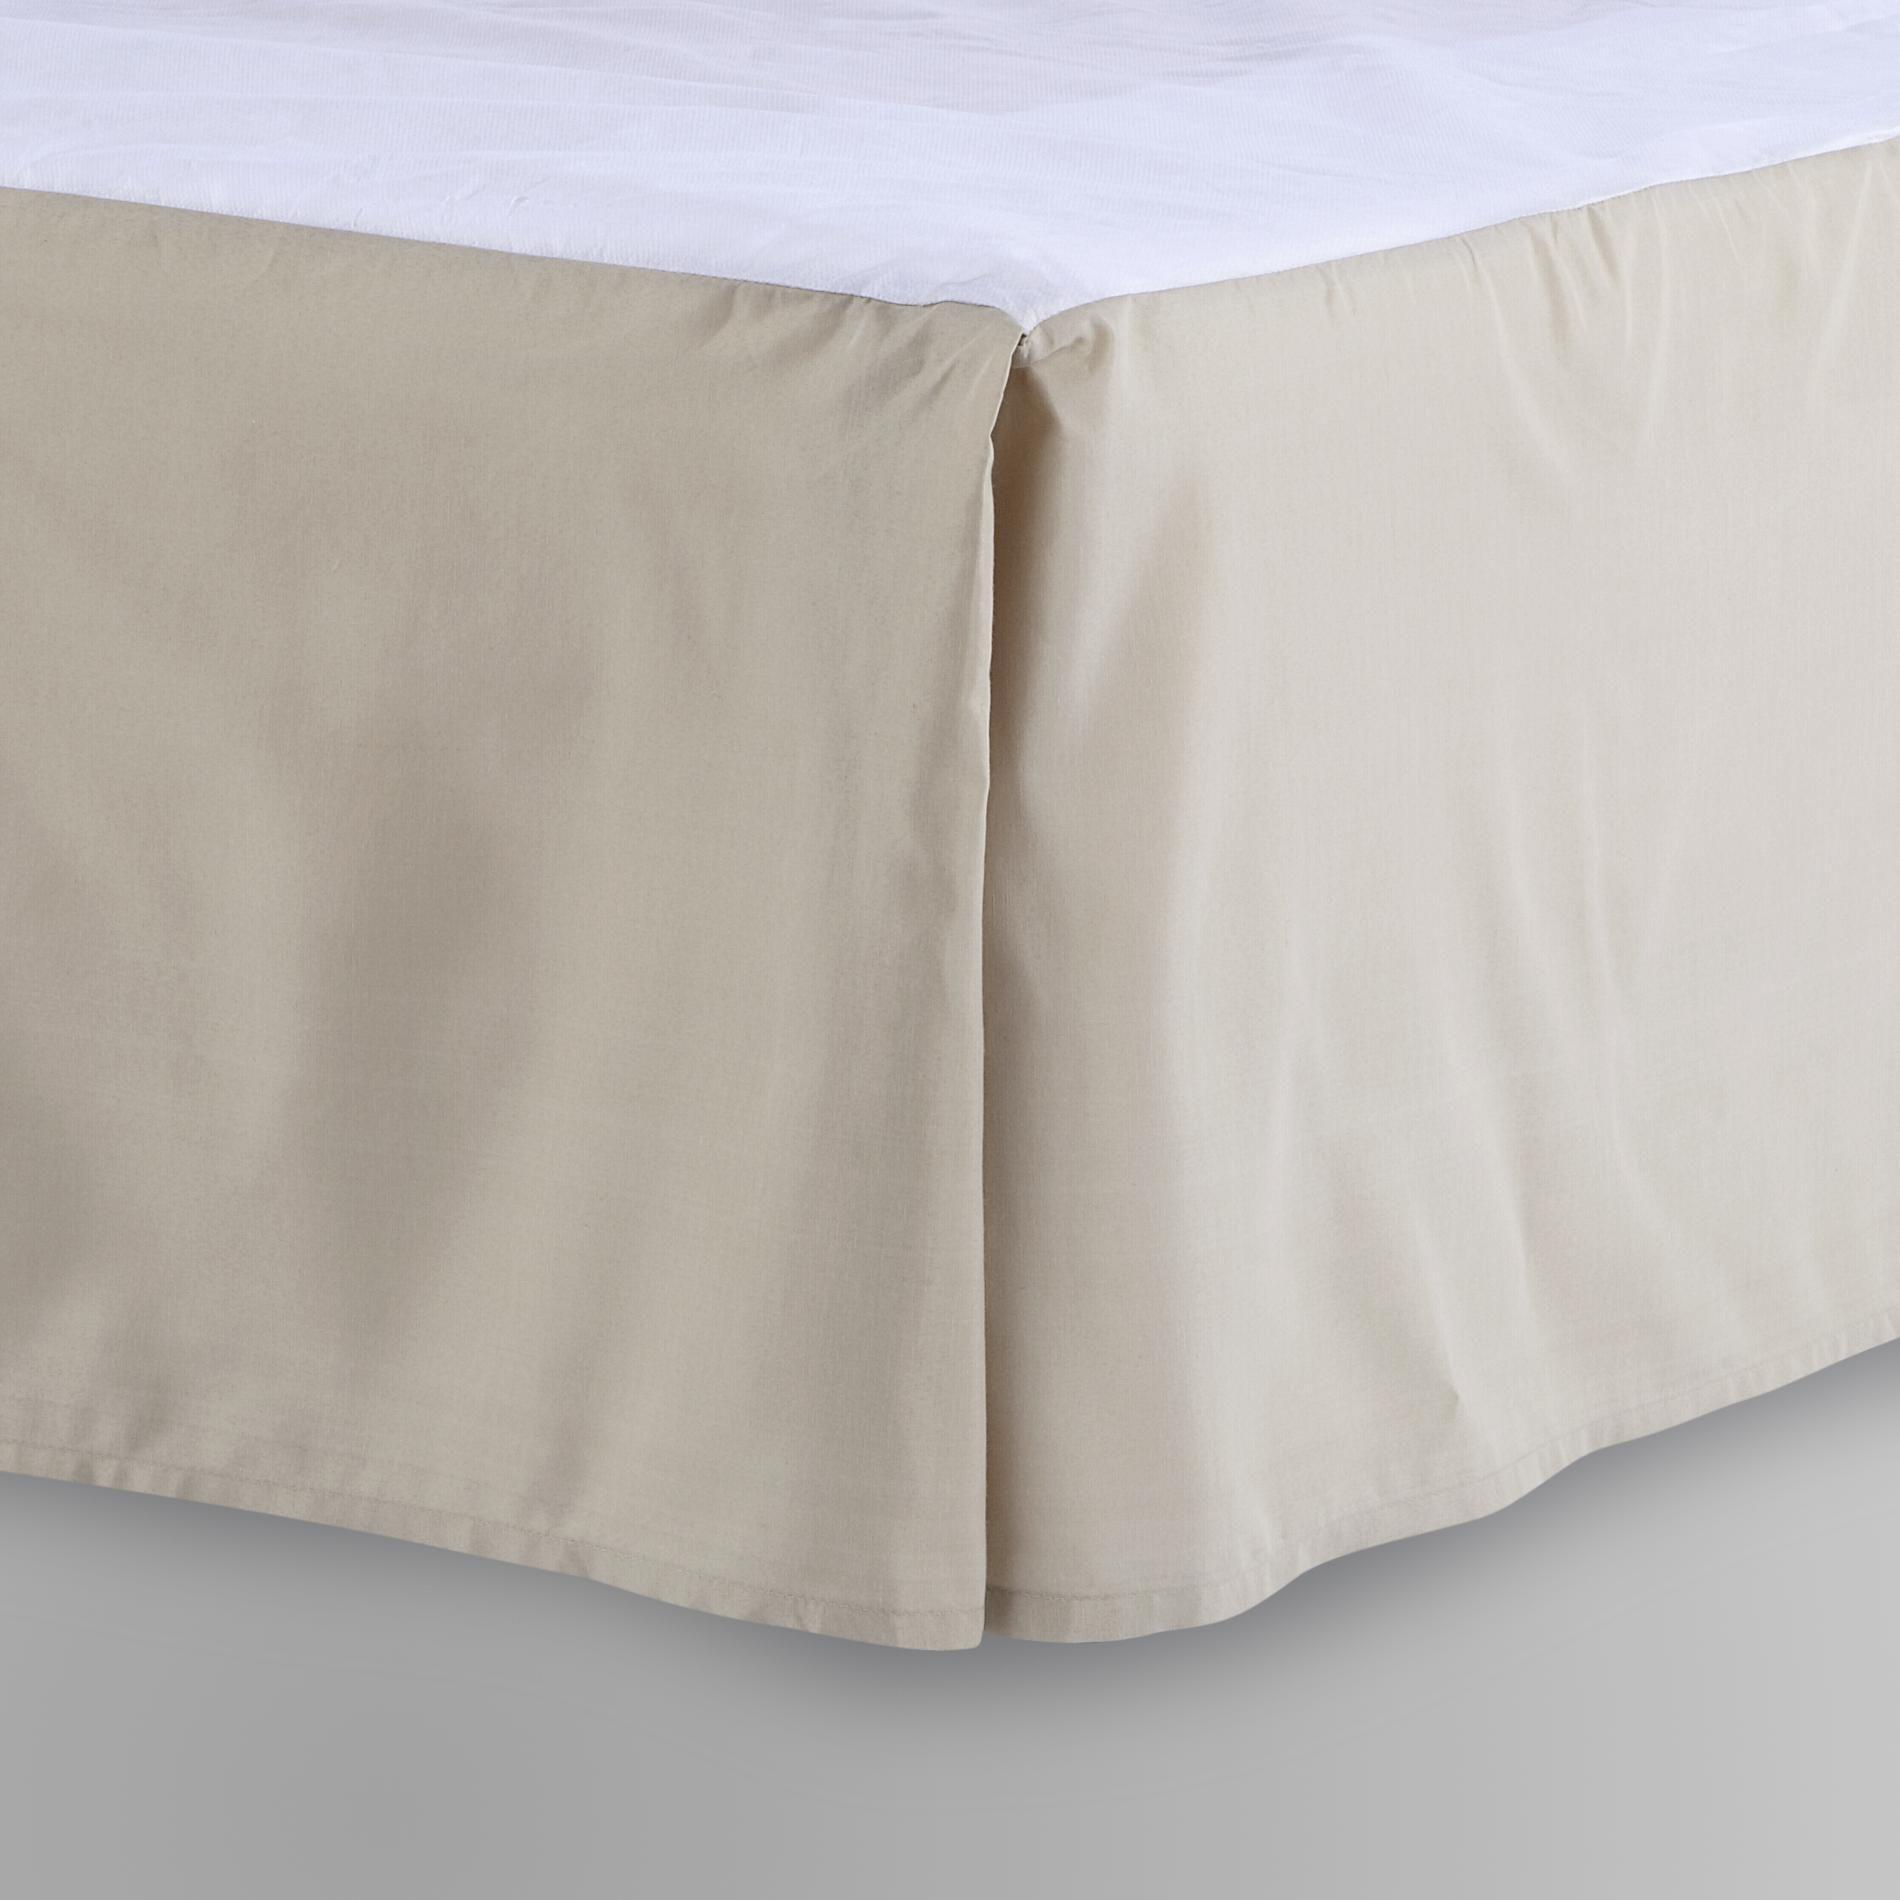 Cannon Woven Bed Skirt - Khaki Home & Bath